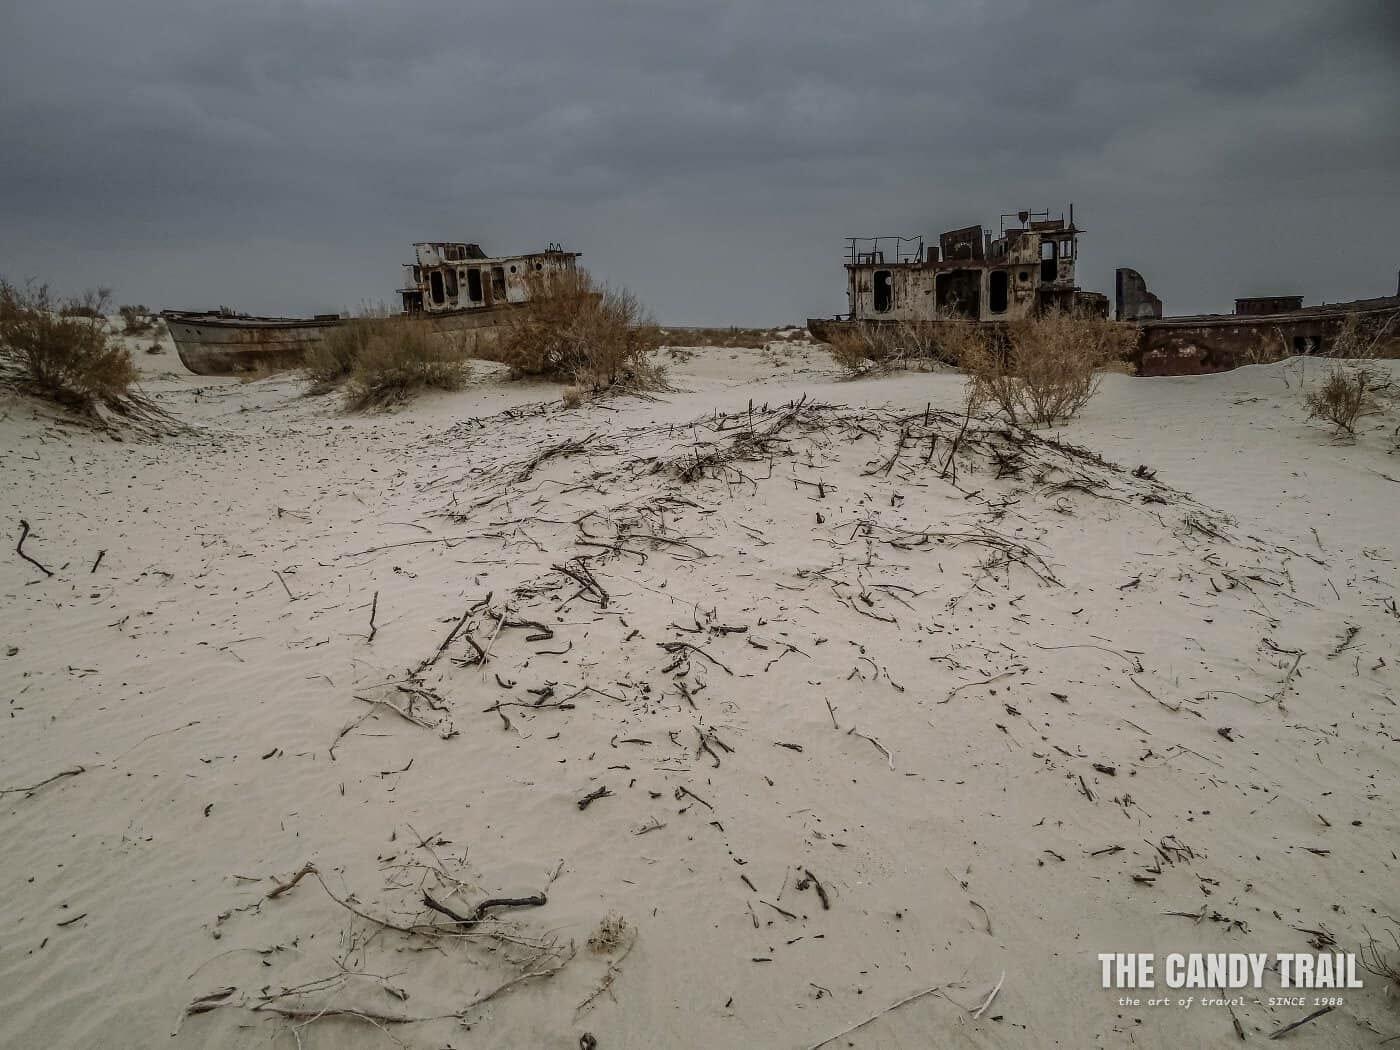 dead ships in sand moynaq aral sea